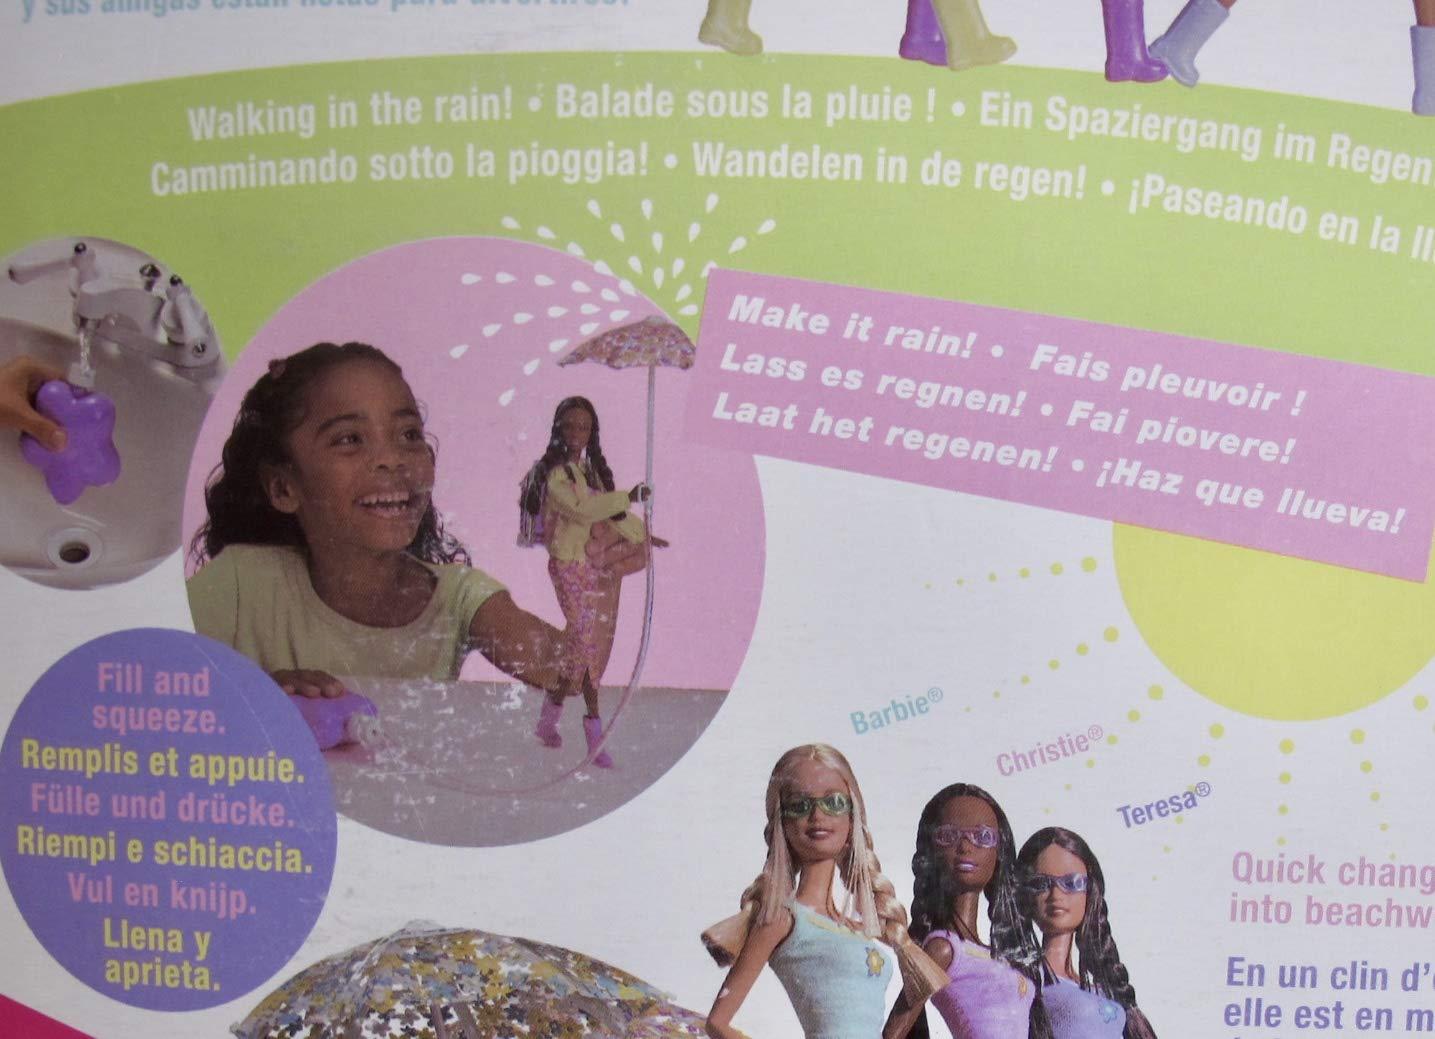 Amazon.com: Barbie CHRISTIE RAIN OR SUN DOLL AA w RAIN